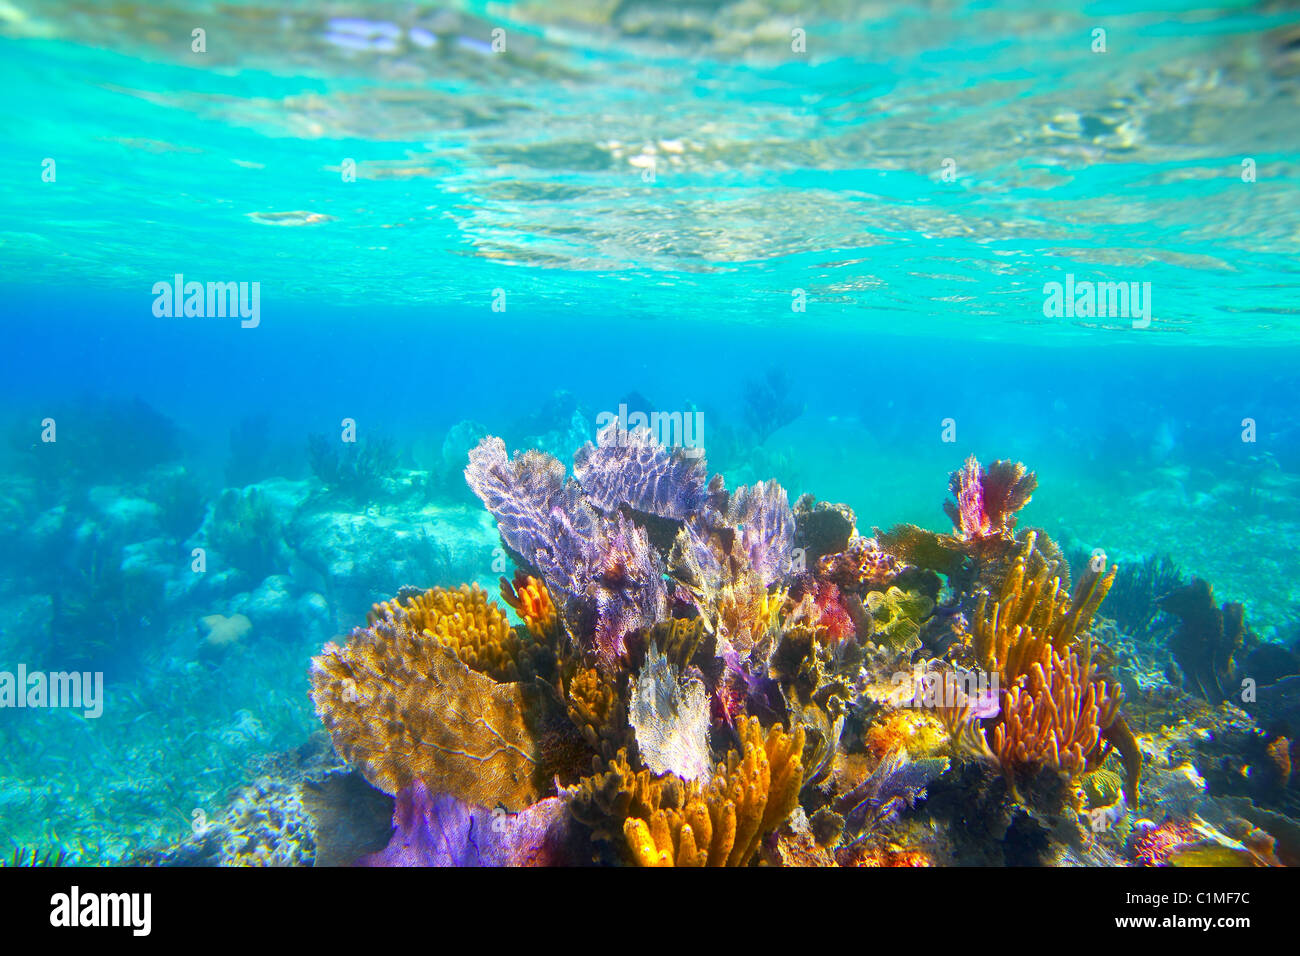 Mayan Riviera reef snorkel underwater coral colorful paradise - Stock Image